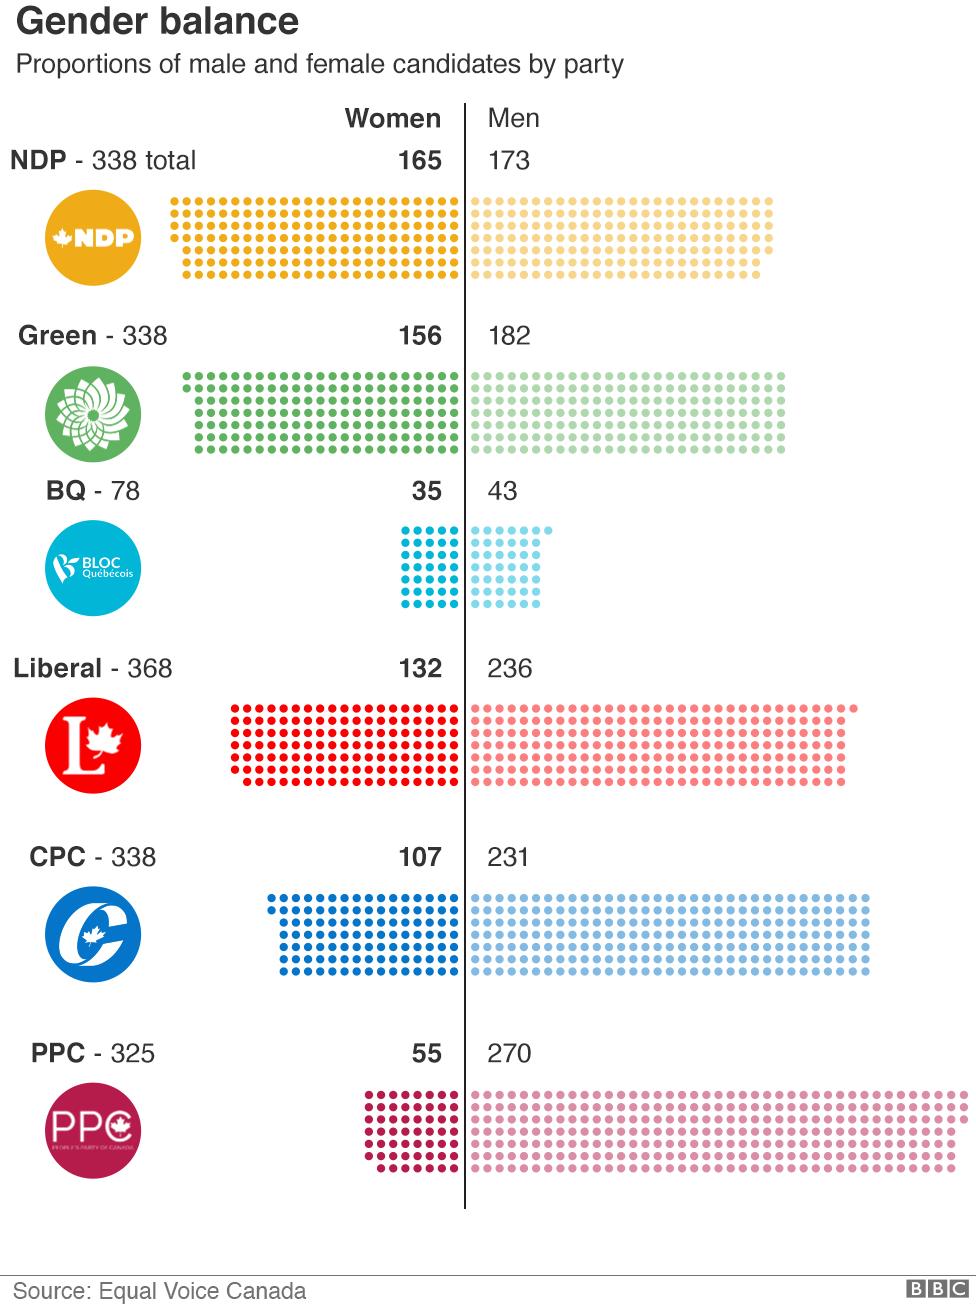 Chart on gender balance of candidates